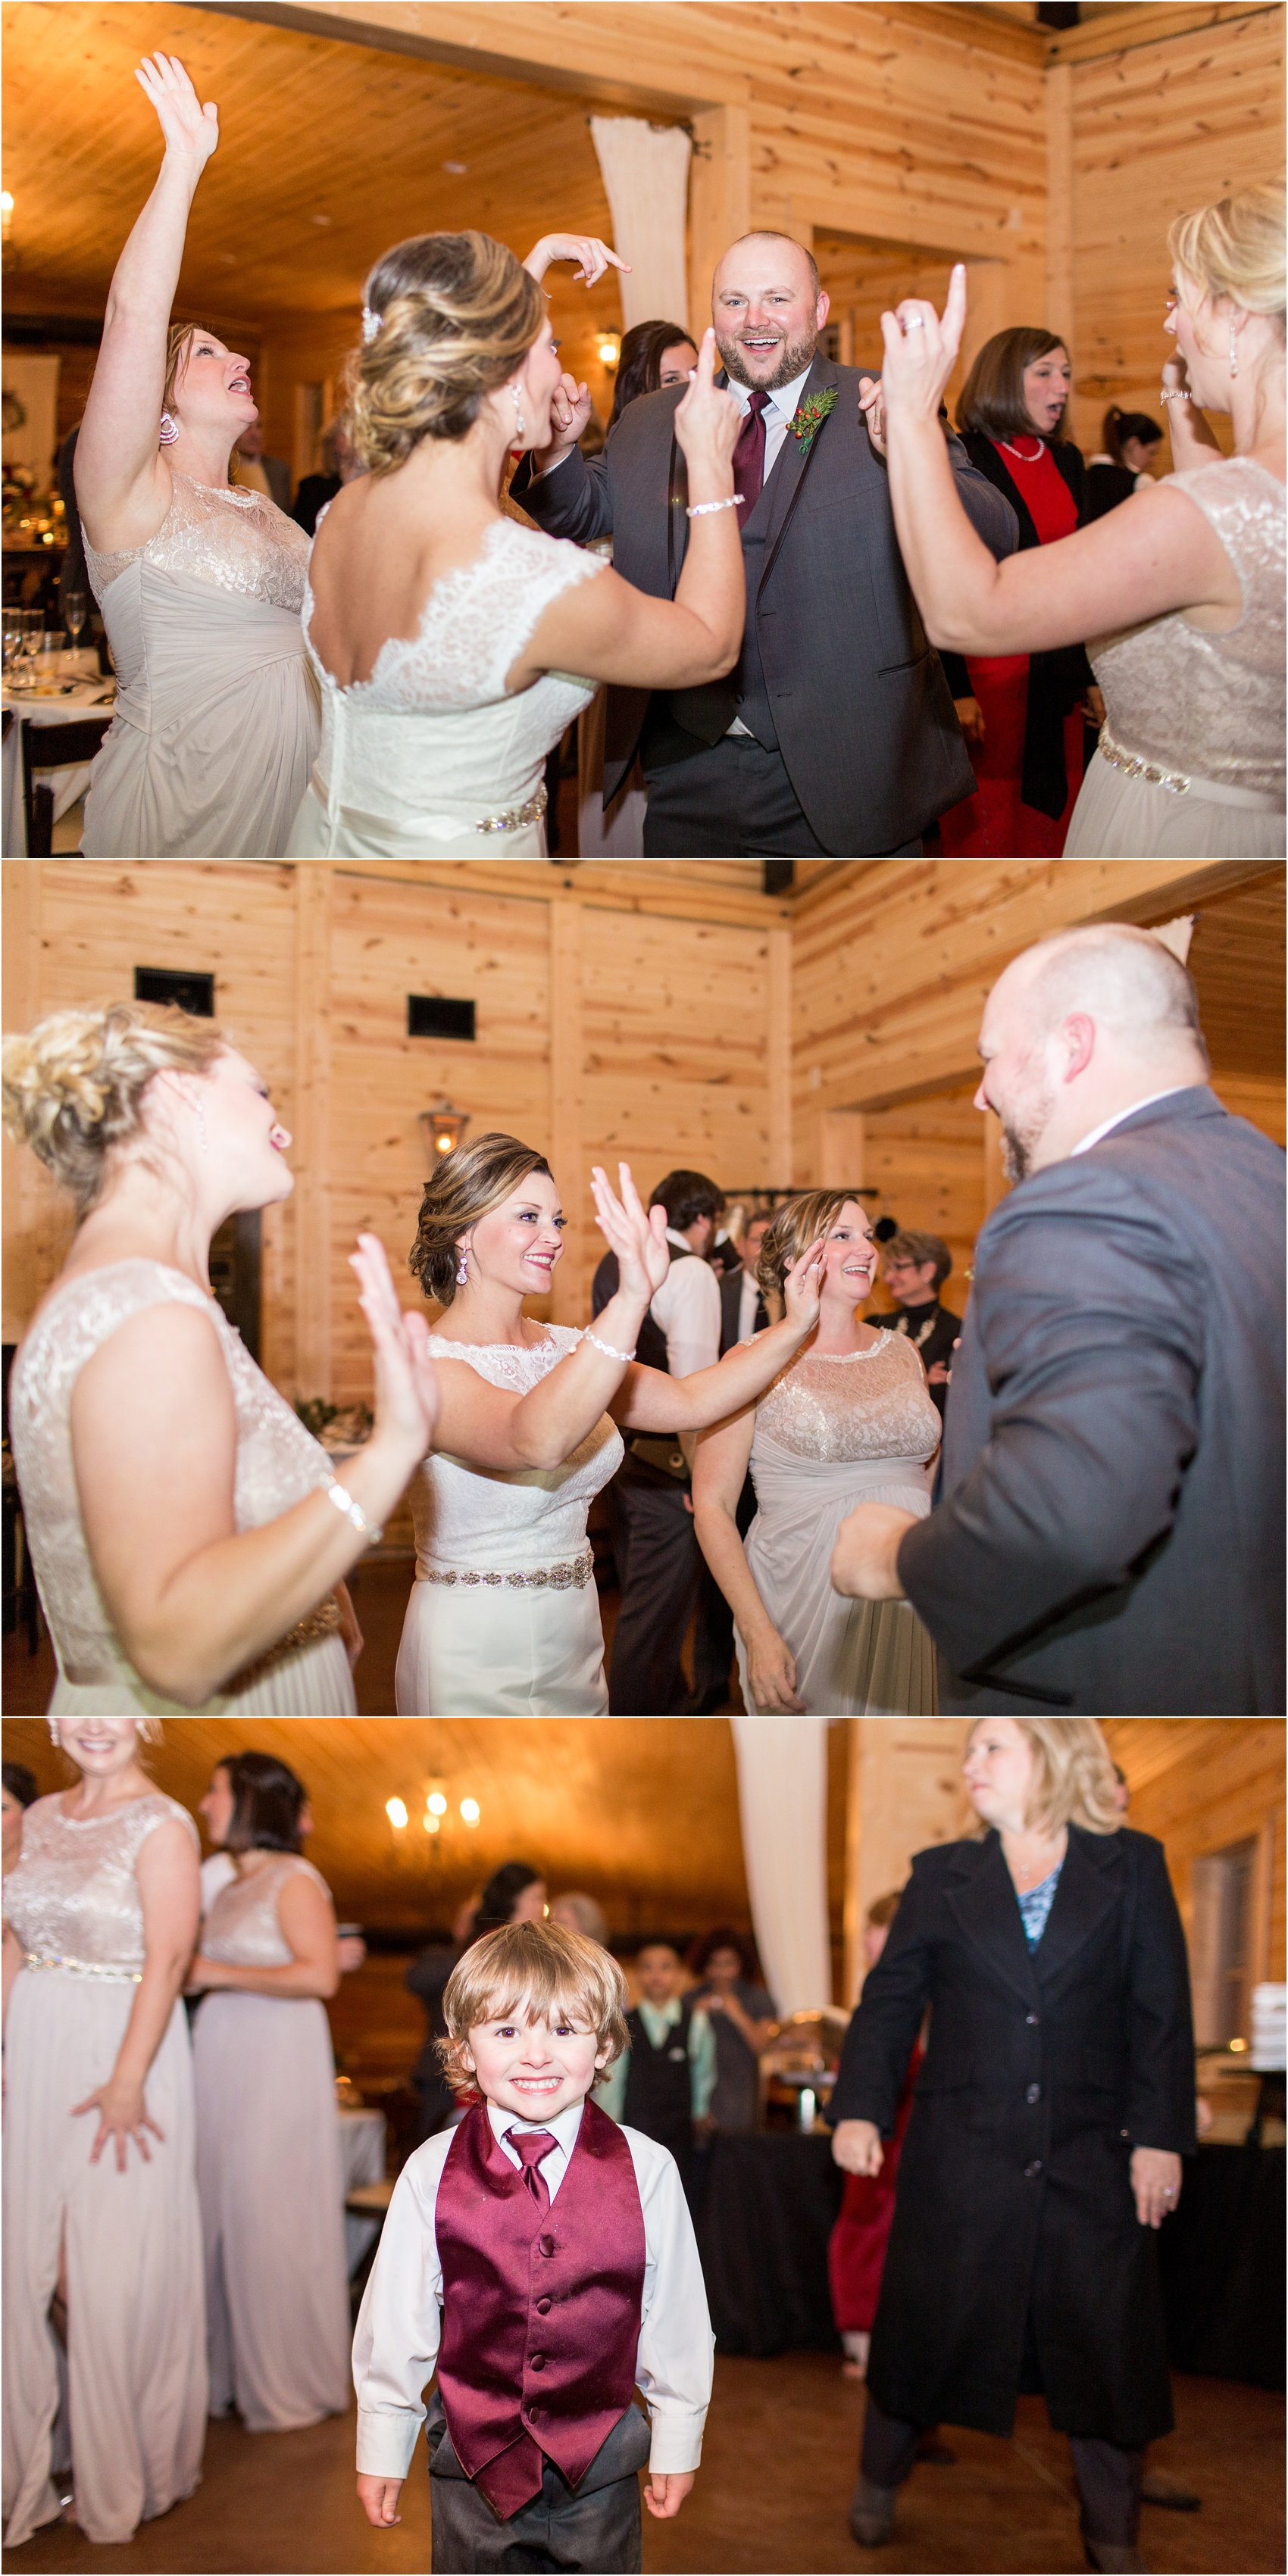 Savannah Eve Photography- Page Wedding Blog-94.jpg